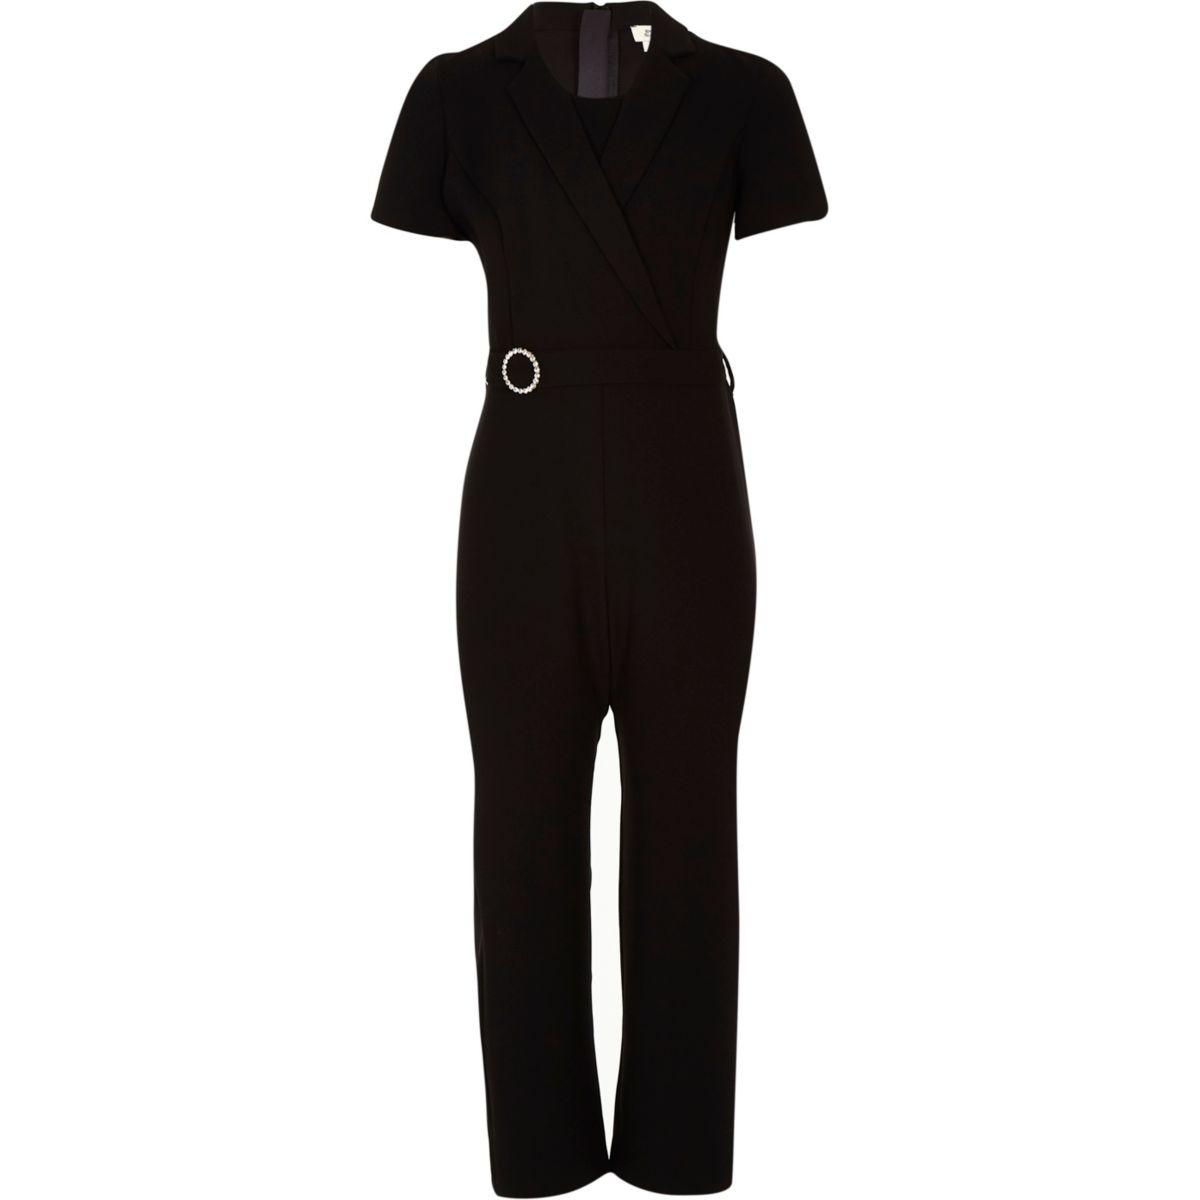 Girls black rhinestone tux jumpsuit